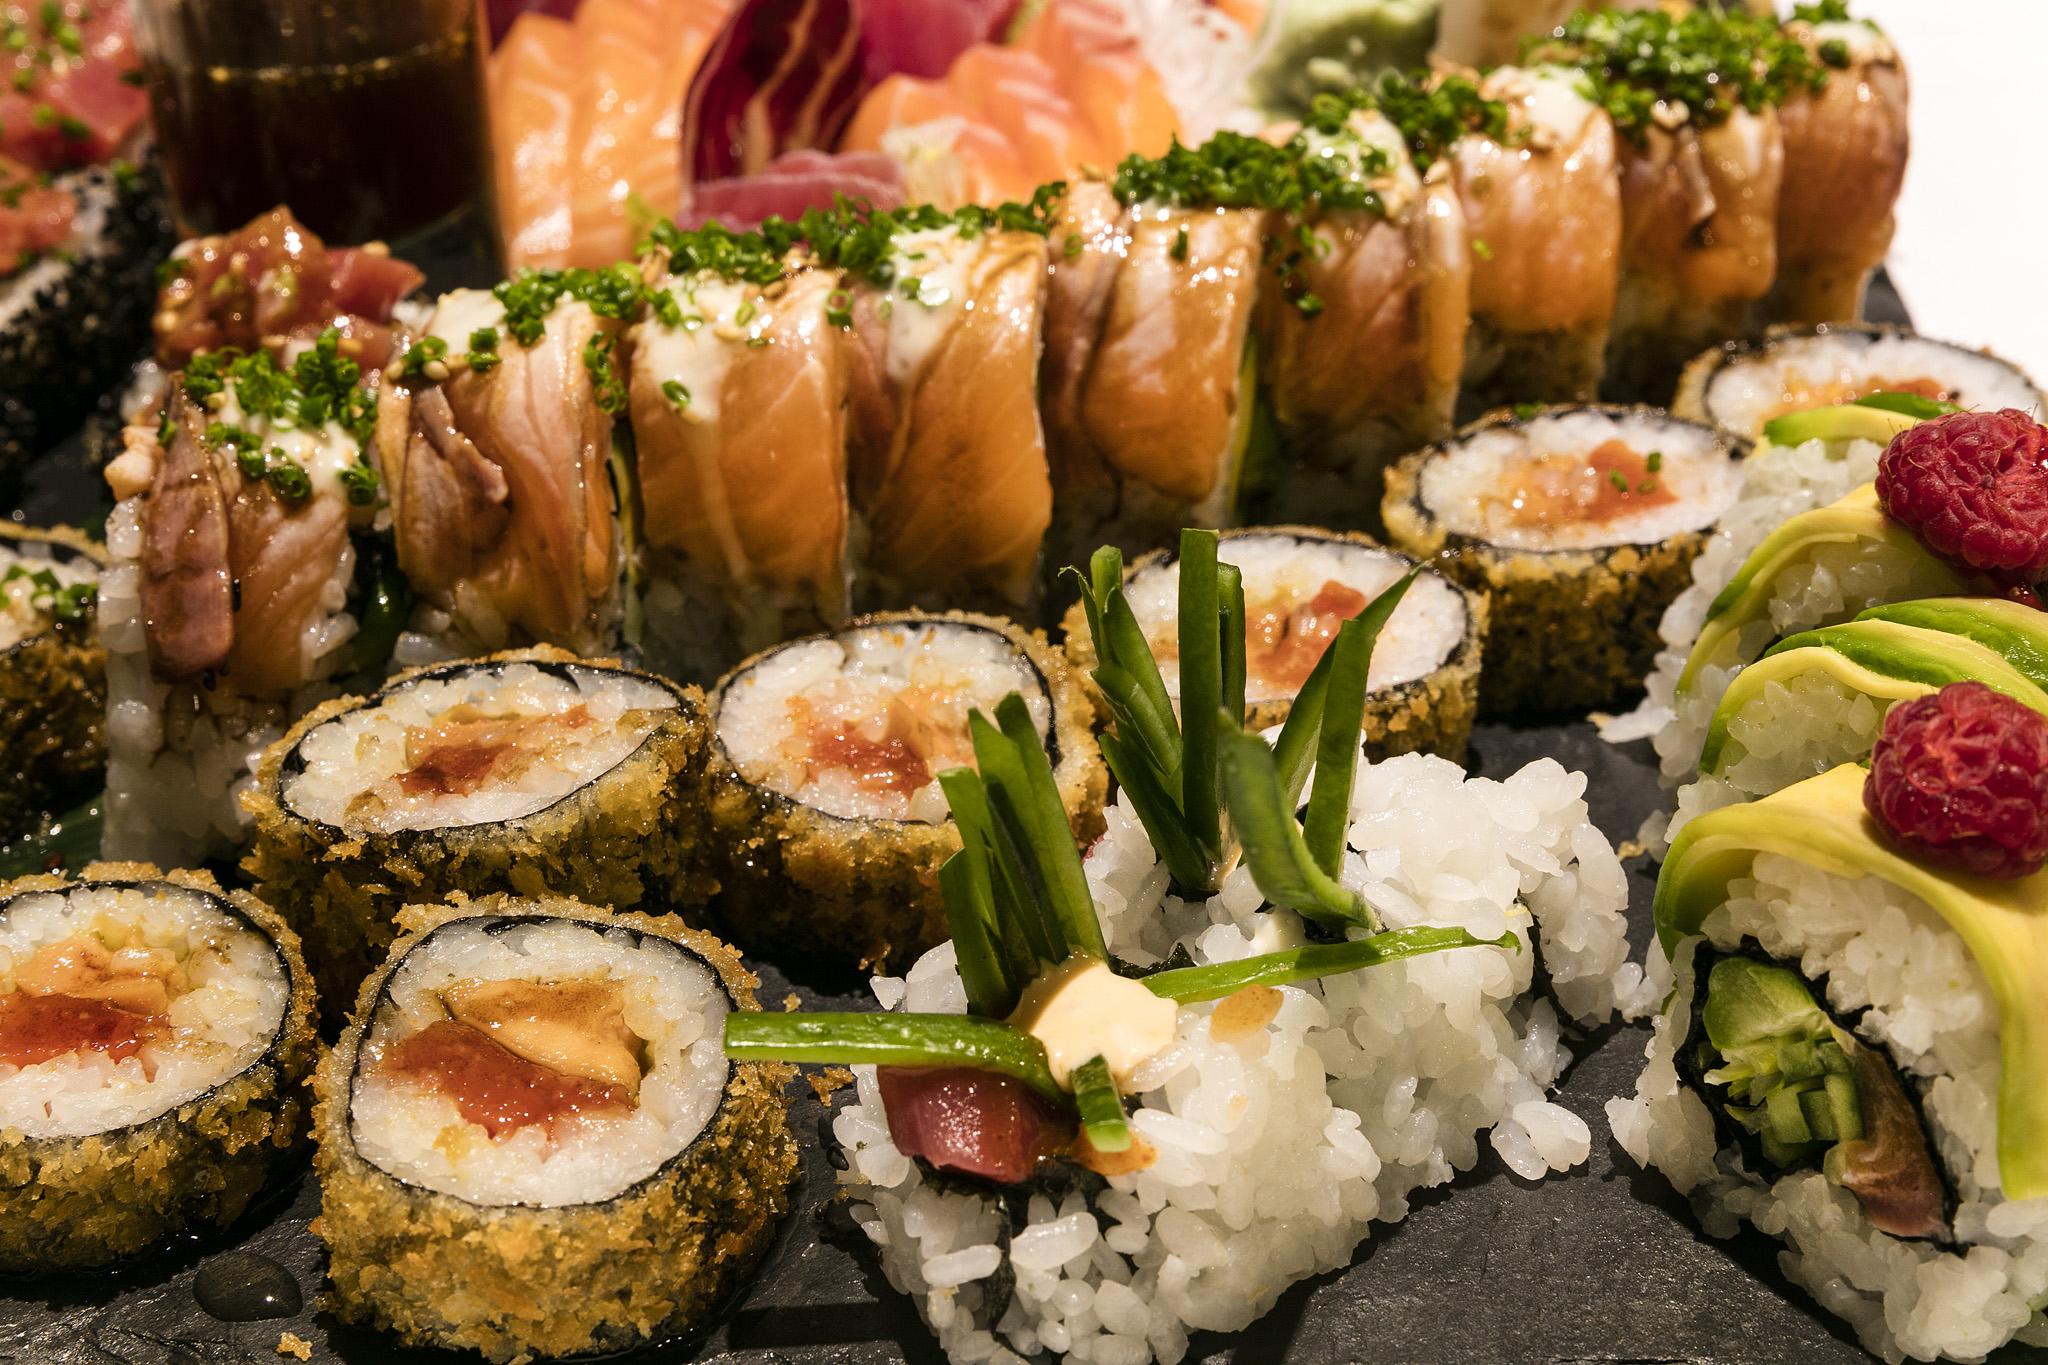 Sushi Restaurant in Baqueira | La Pleta Sushi Restaurant